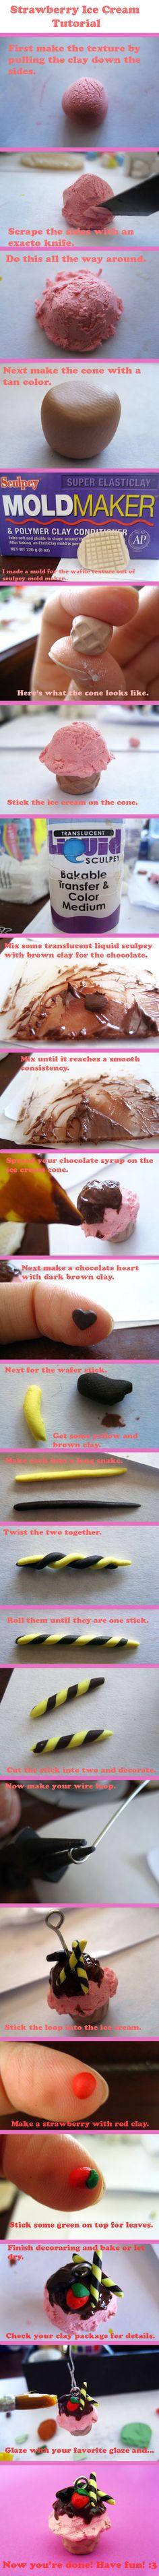 Strawberry Ice Cream Tutorial by ~mAd-ArIsToCrAt on deviantART